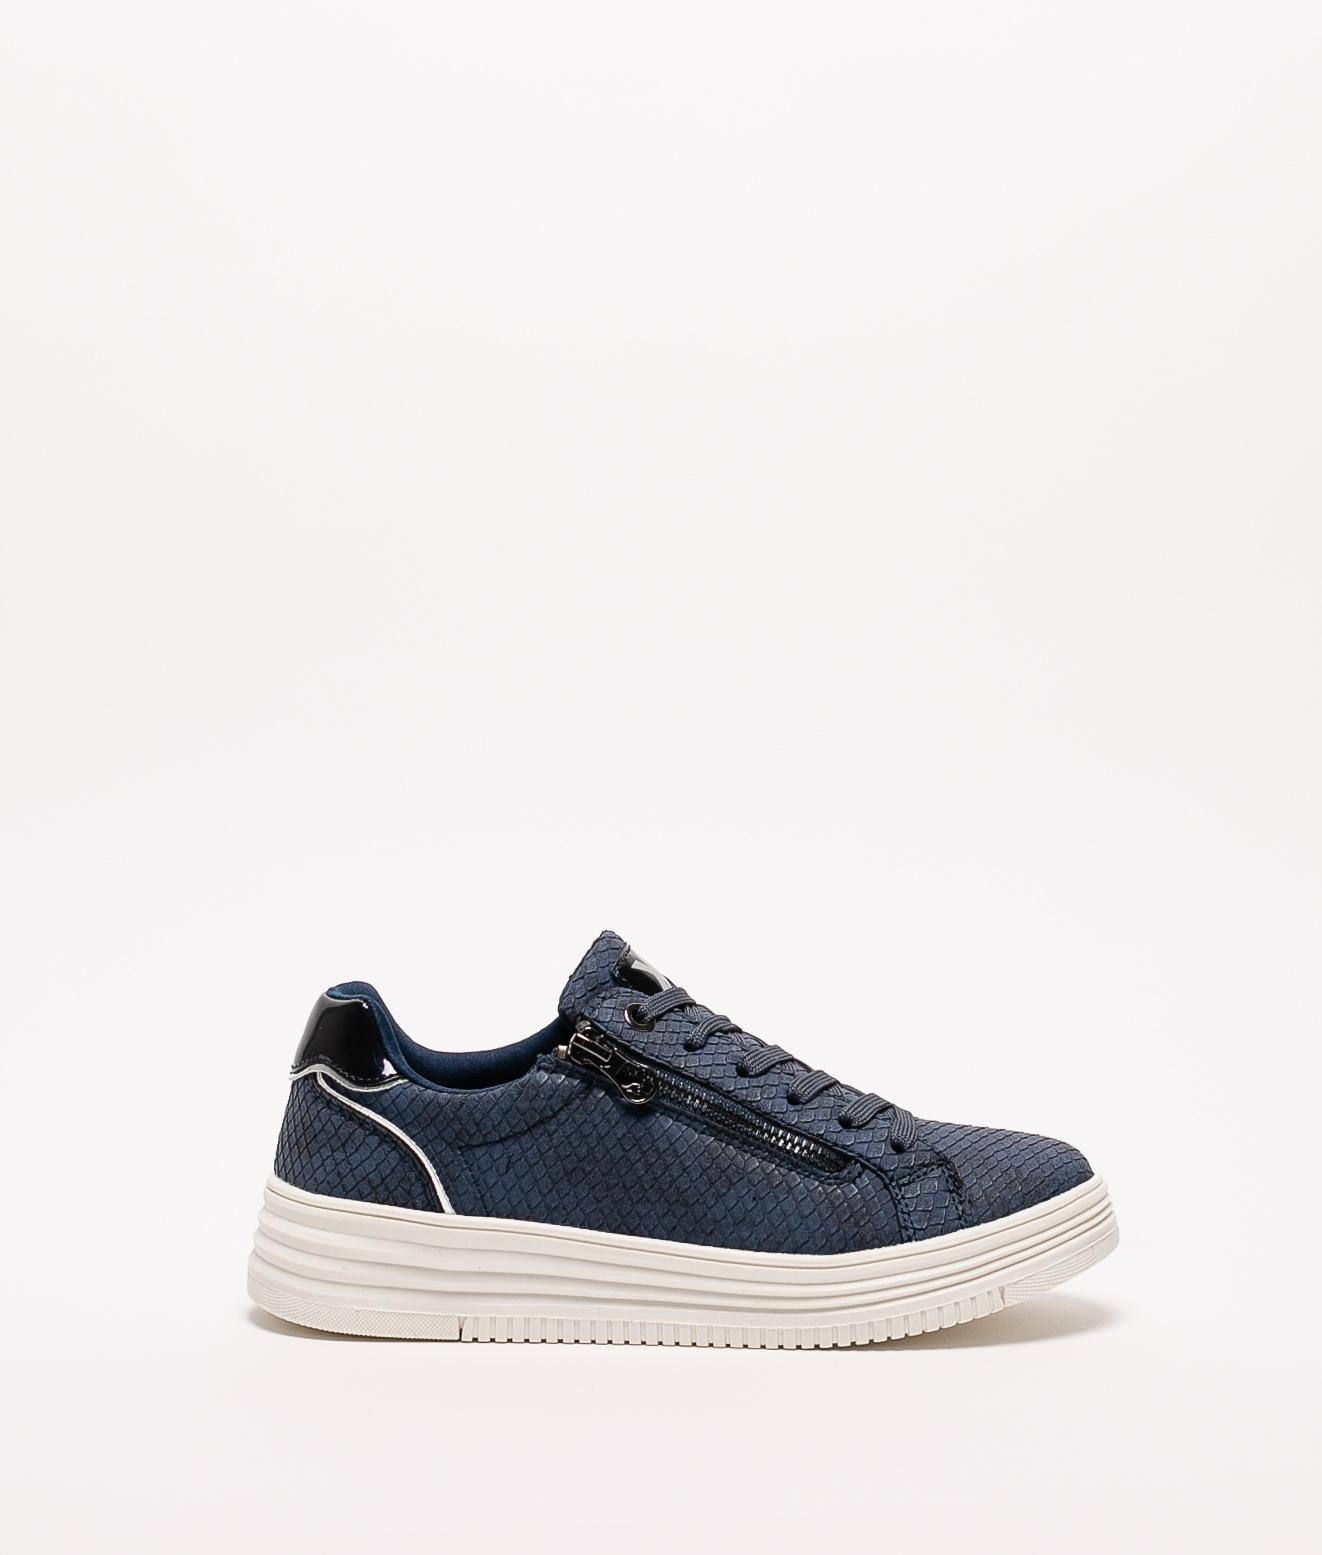 Sneakers Soule Xti - Blue